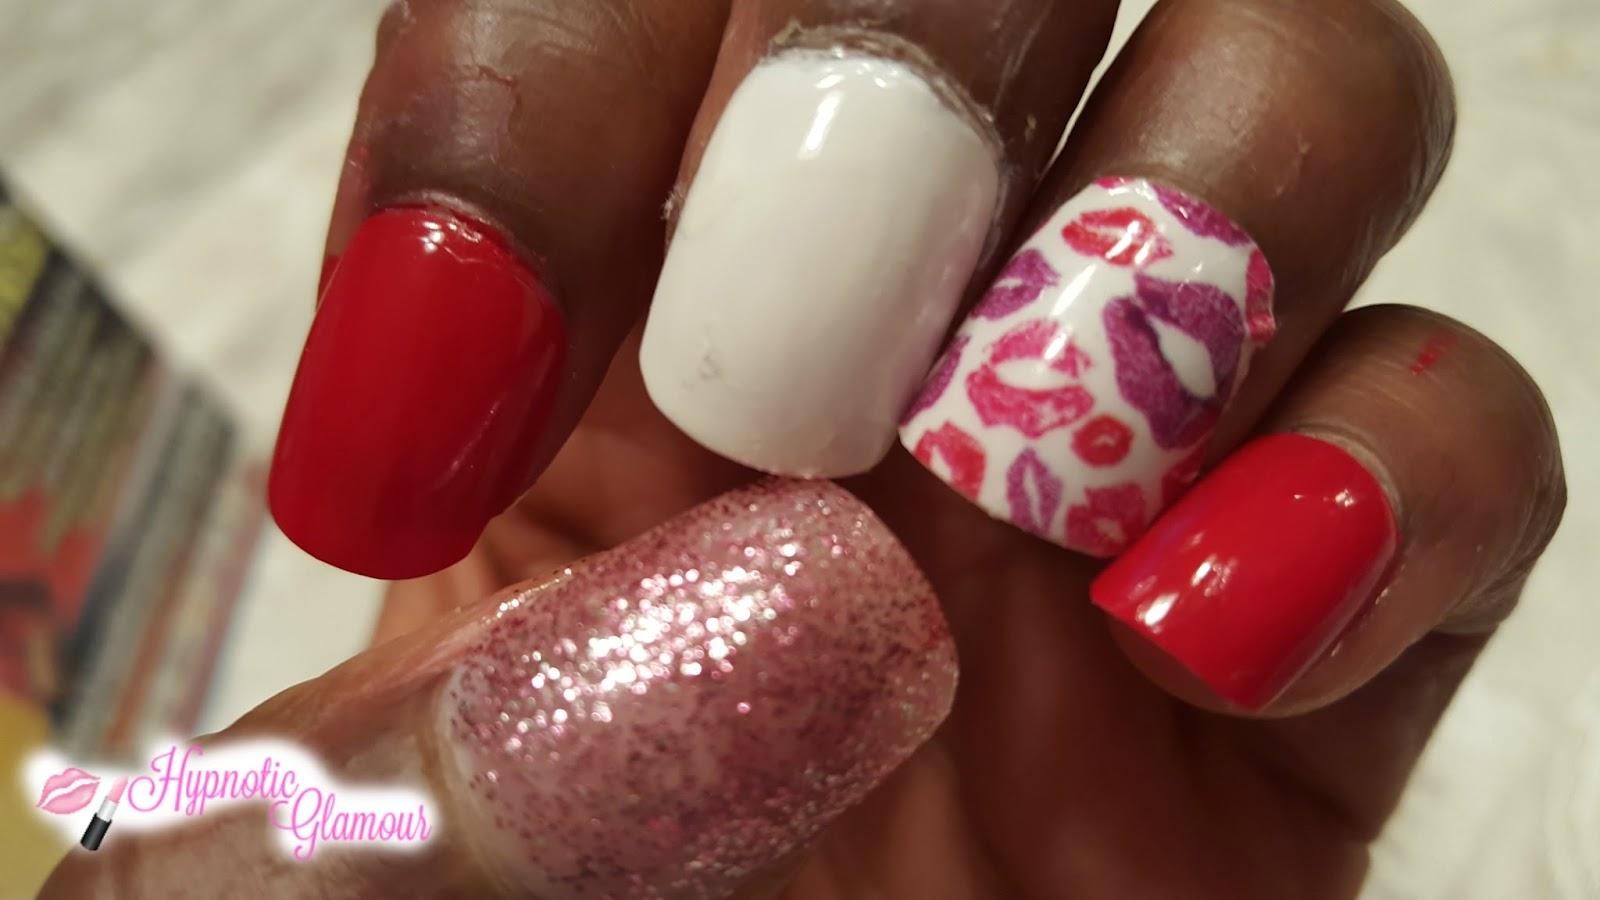 Hypnotic Glamour Beauty Blog Sally Hansen Salon Effects Giving Lip